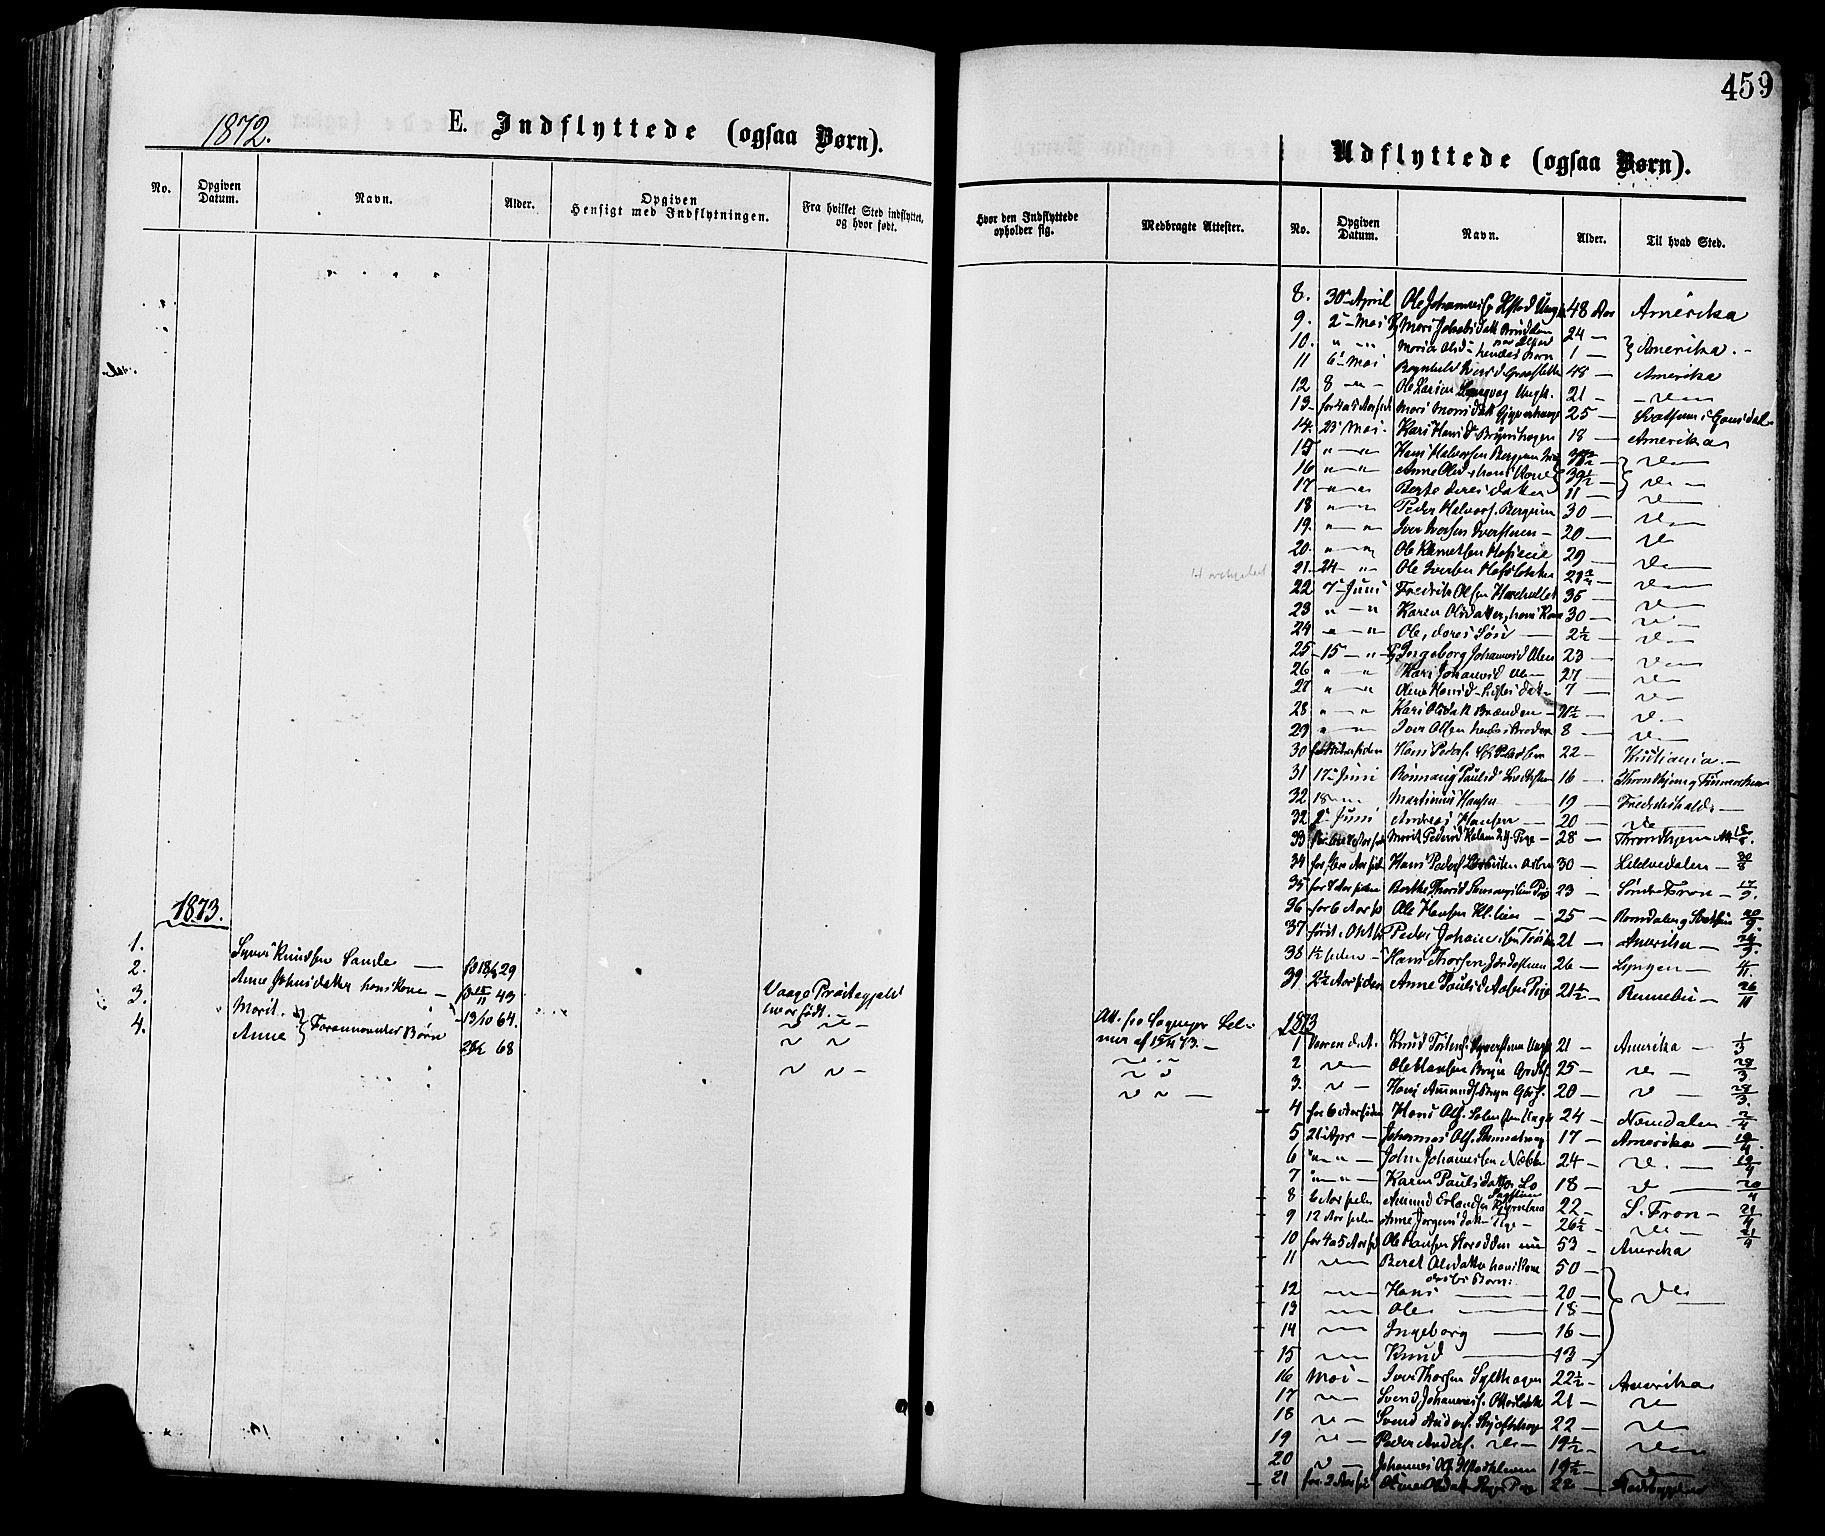 SAH, Nord-Fron prestekontor, Ministerialbok nr. 2, 1865-1883, s. 459